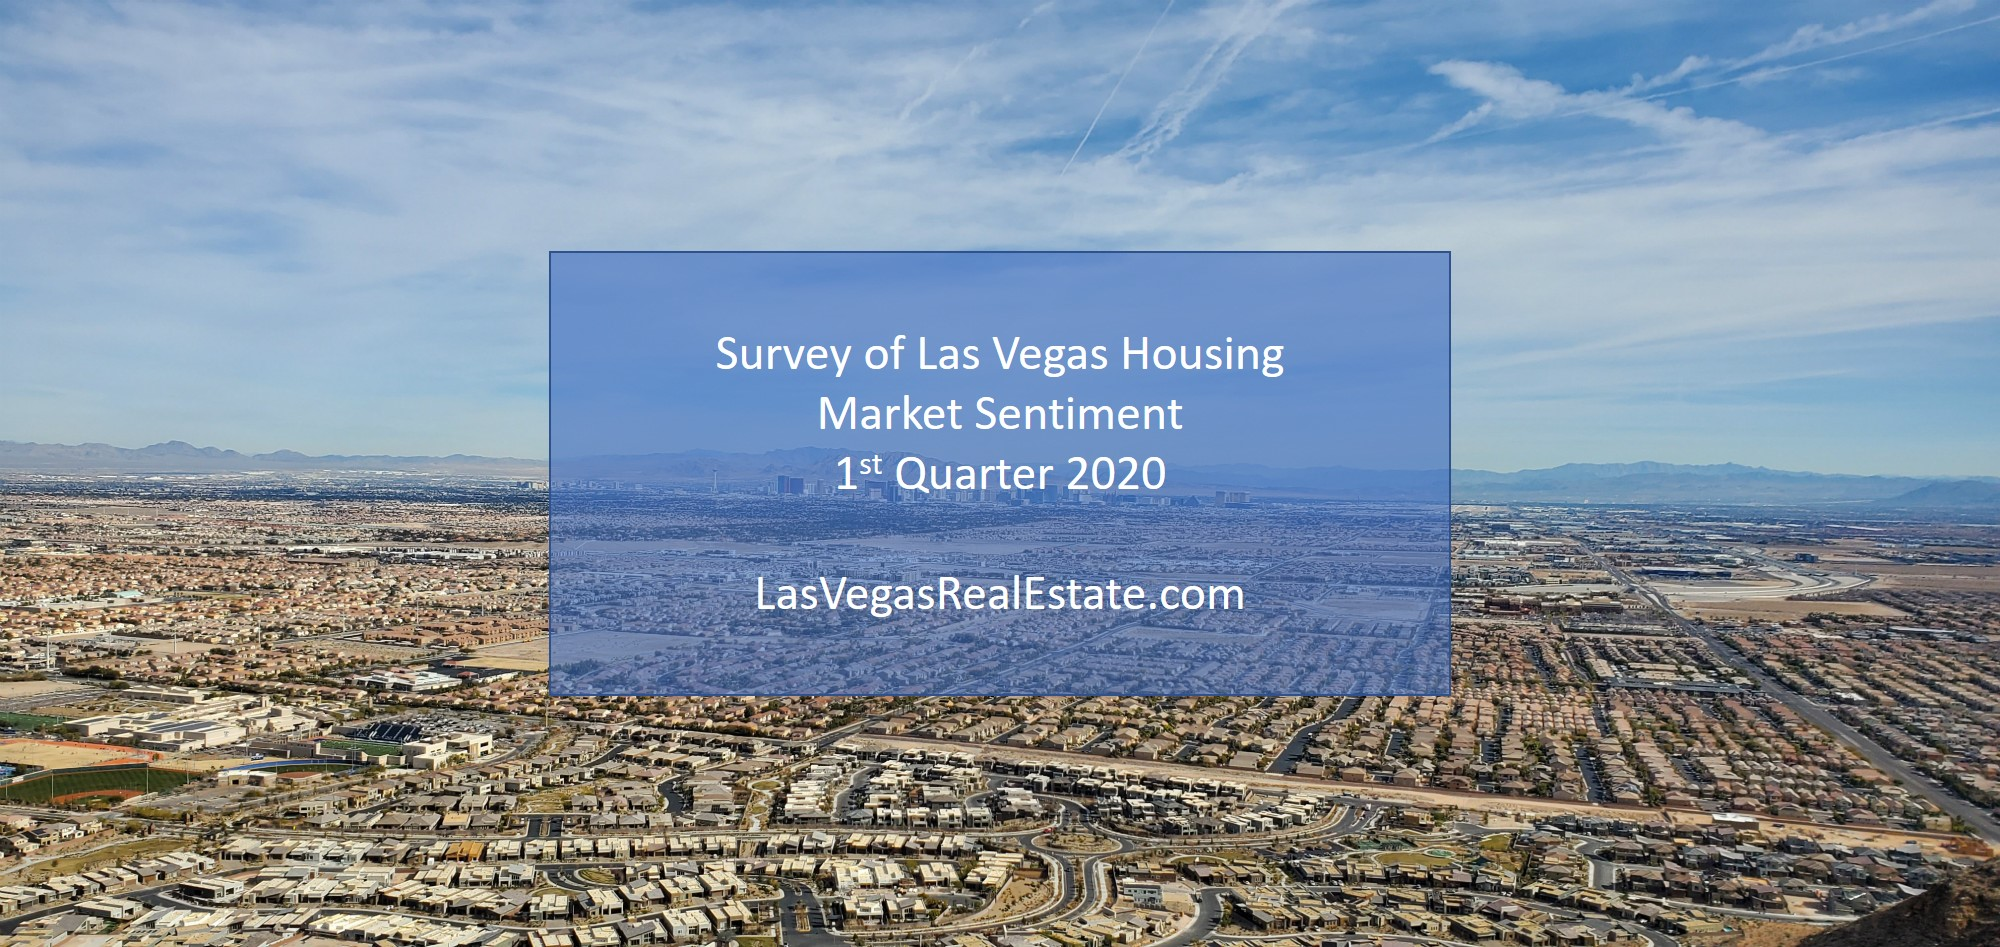 Las Vegas Housing Market - LasVegasRealEstate.com